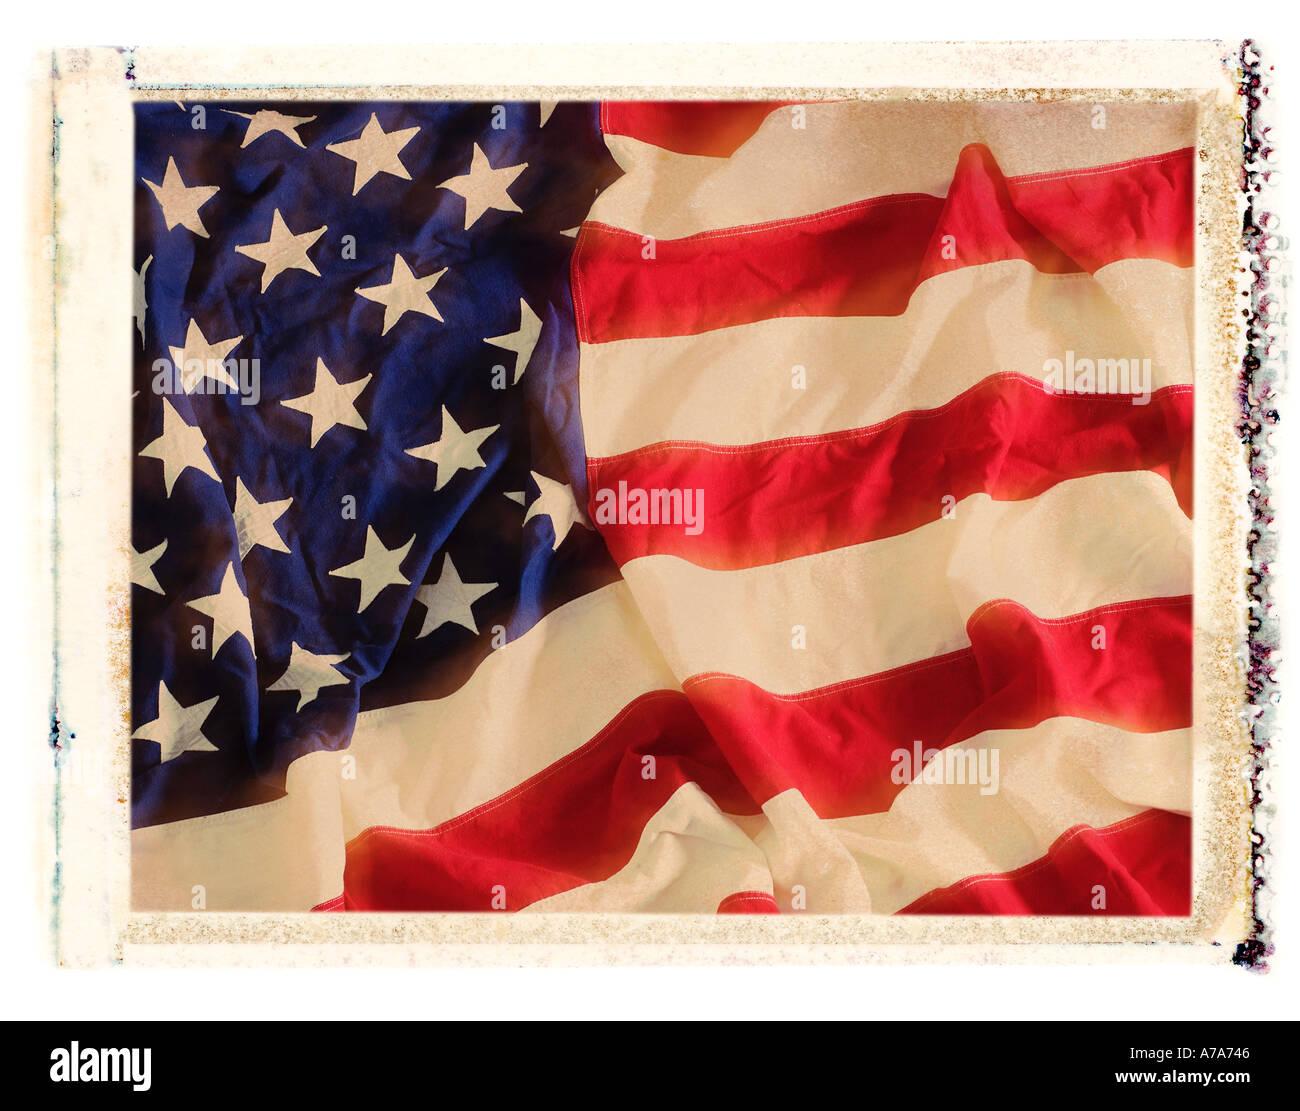 a7dedf9337f Vintage American Flag Stock Photos   Vintage American Flag Stock ...